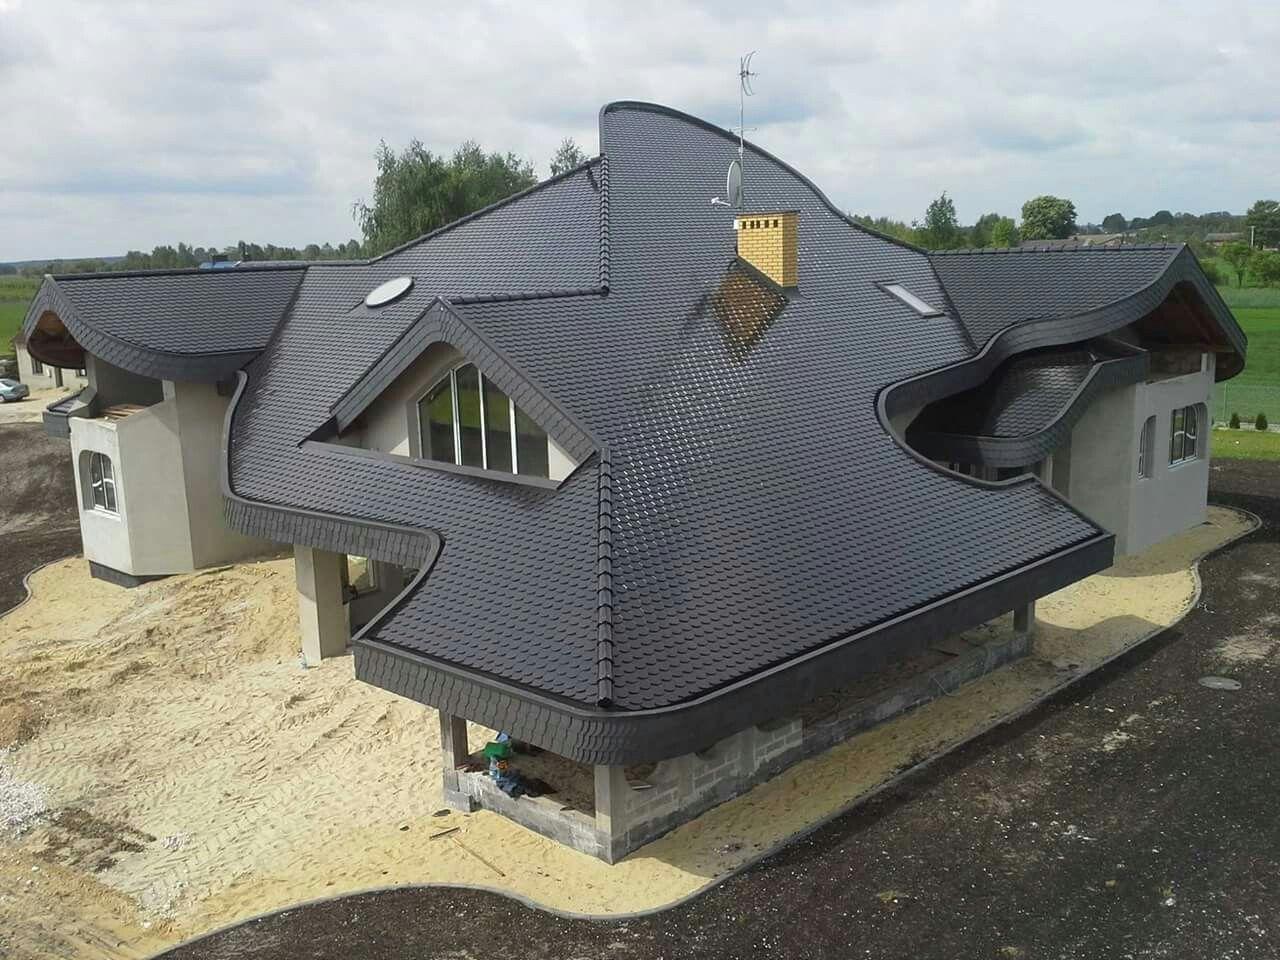 Unique Roof Poland Architecture Design House Exterior Architecture